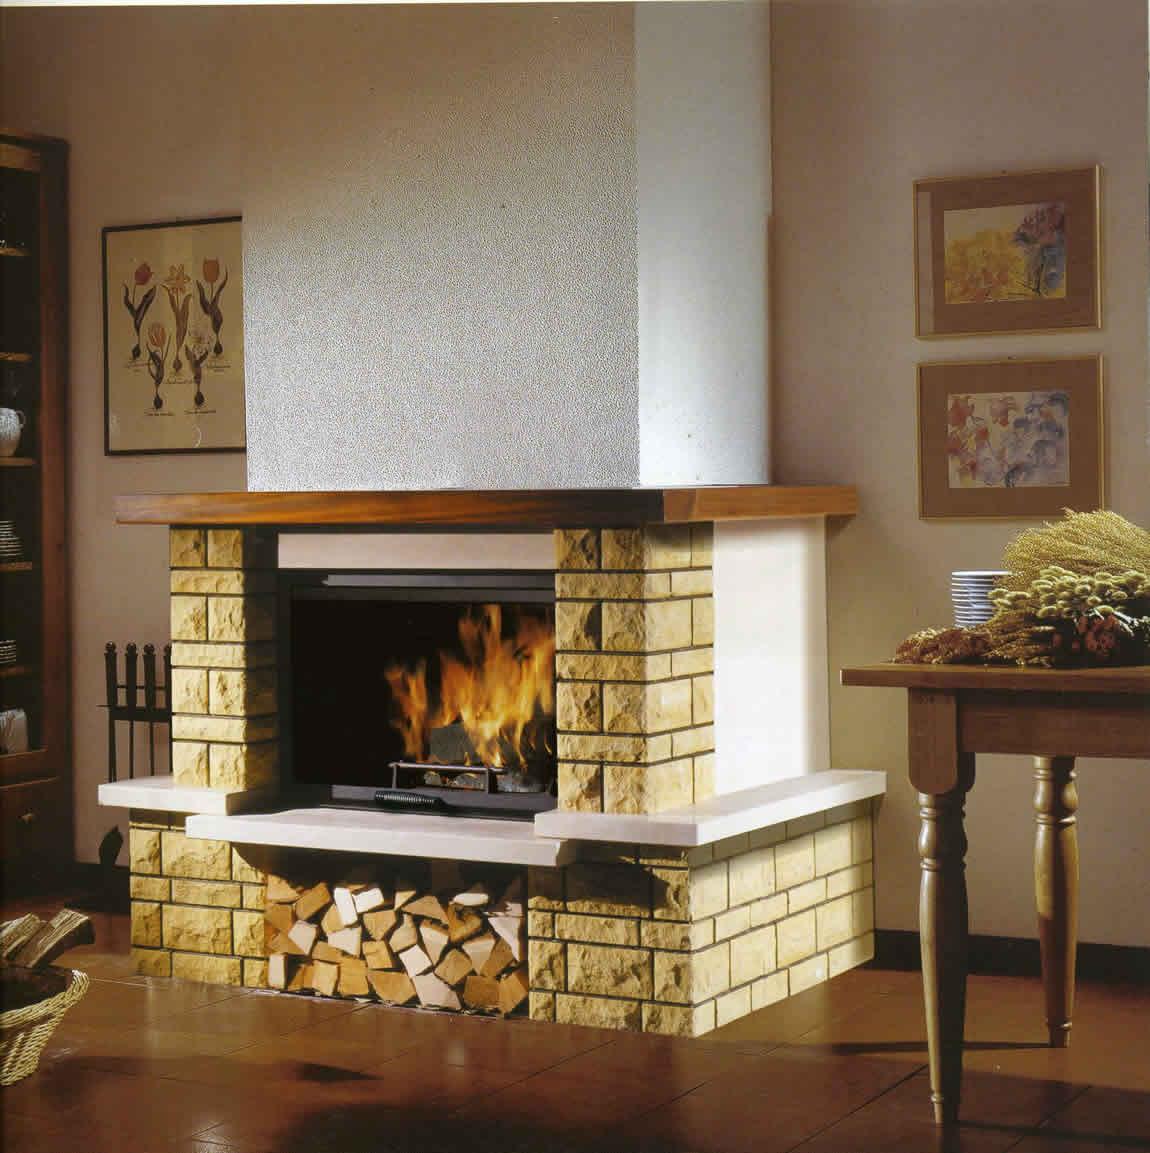 Chimeneas le a calefactoras - Revestimiento de chimeneas modernas ...